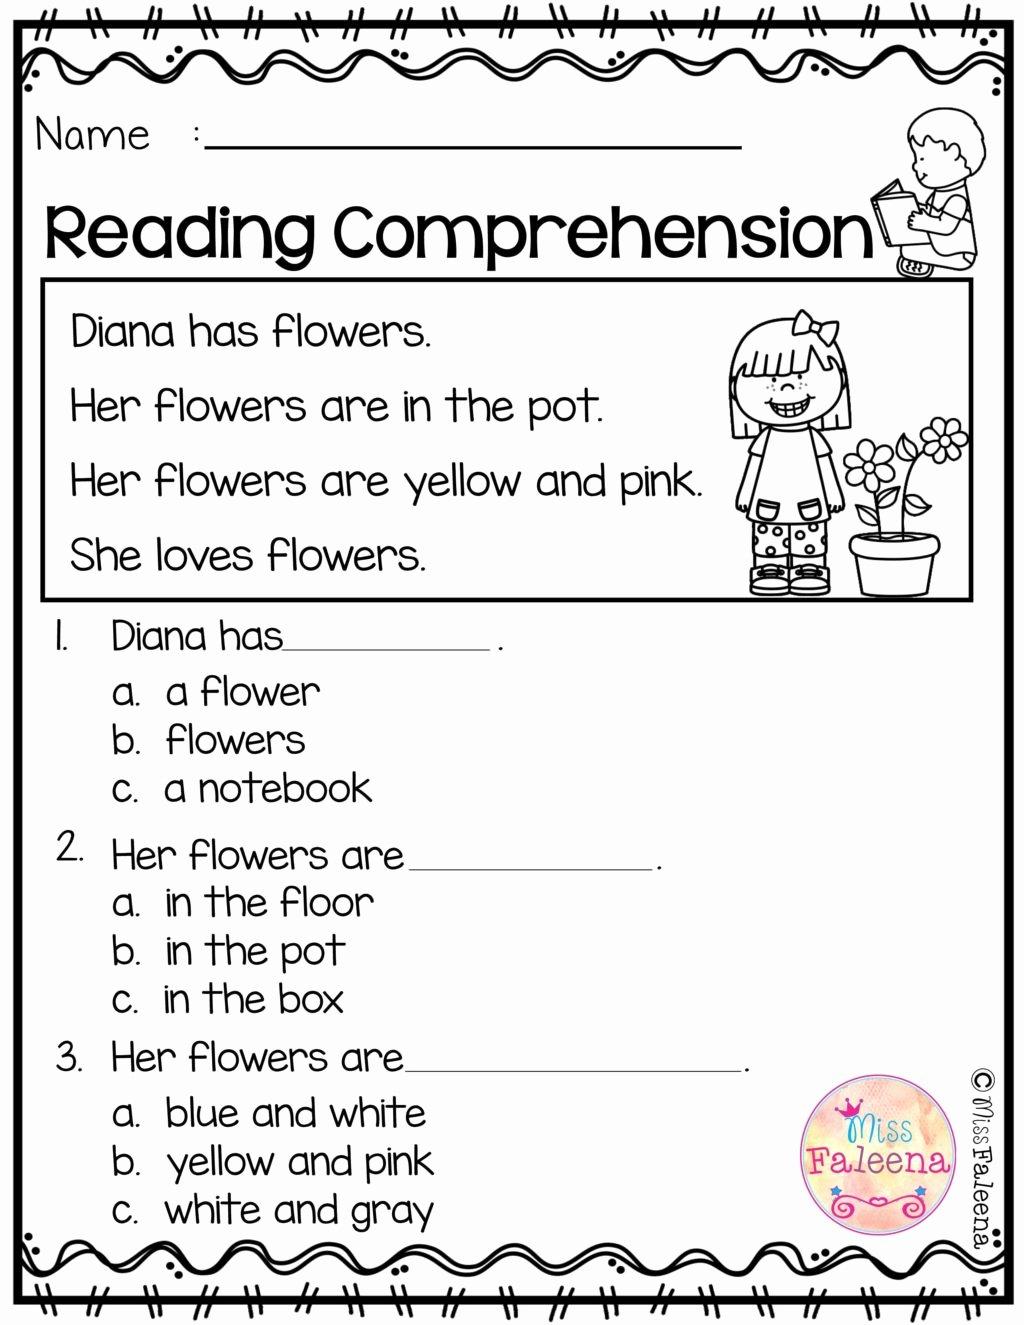 Pre Reading Worksheets for Preschoolers Fresh Worksheet Free Reading Worksheets for Preschool Printable